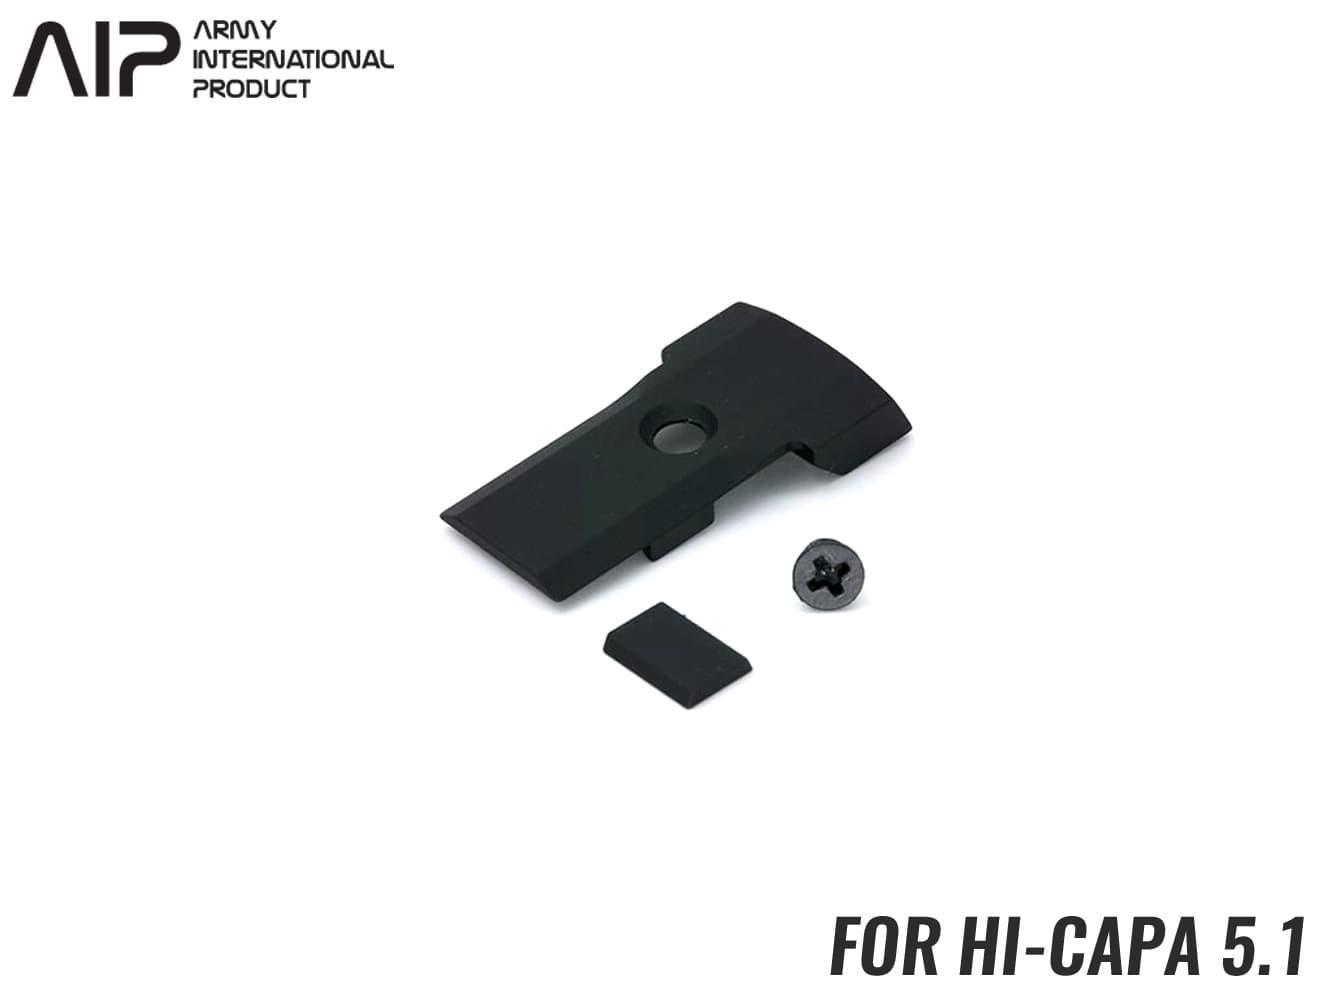 AIP CNC サイトカバー Hi-CAPA5.1◆BK 東京マルイ GBB ハイキャパ5.1対応 スライドカバー スライドの軽量化 アルミ削り出し GOLDマッチ